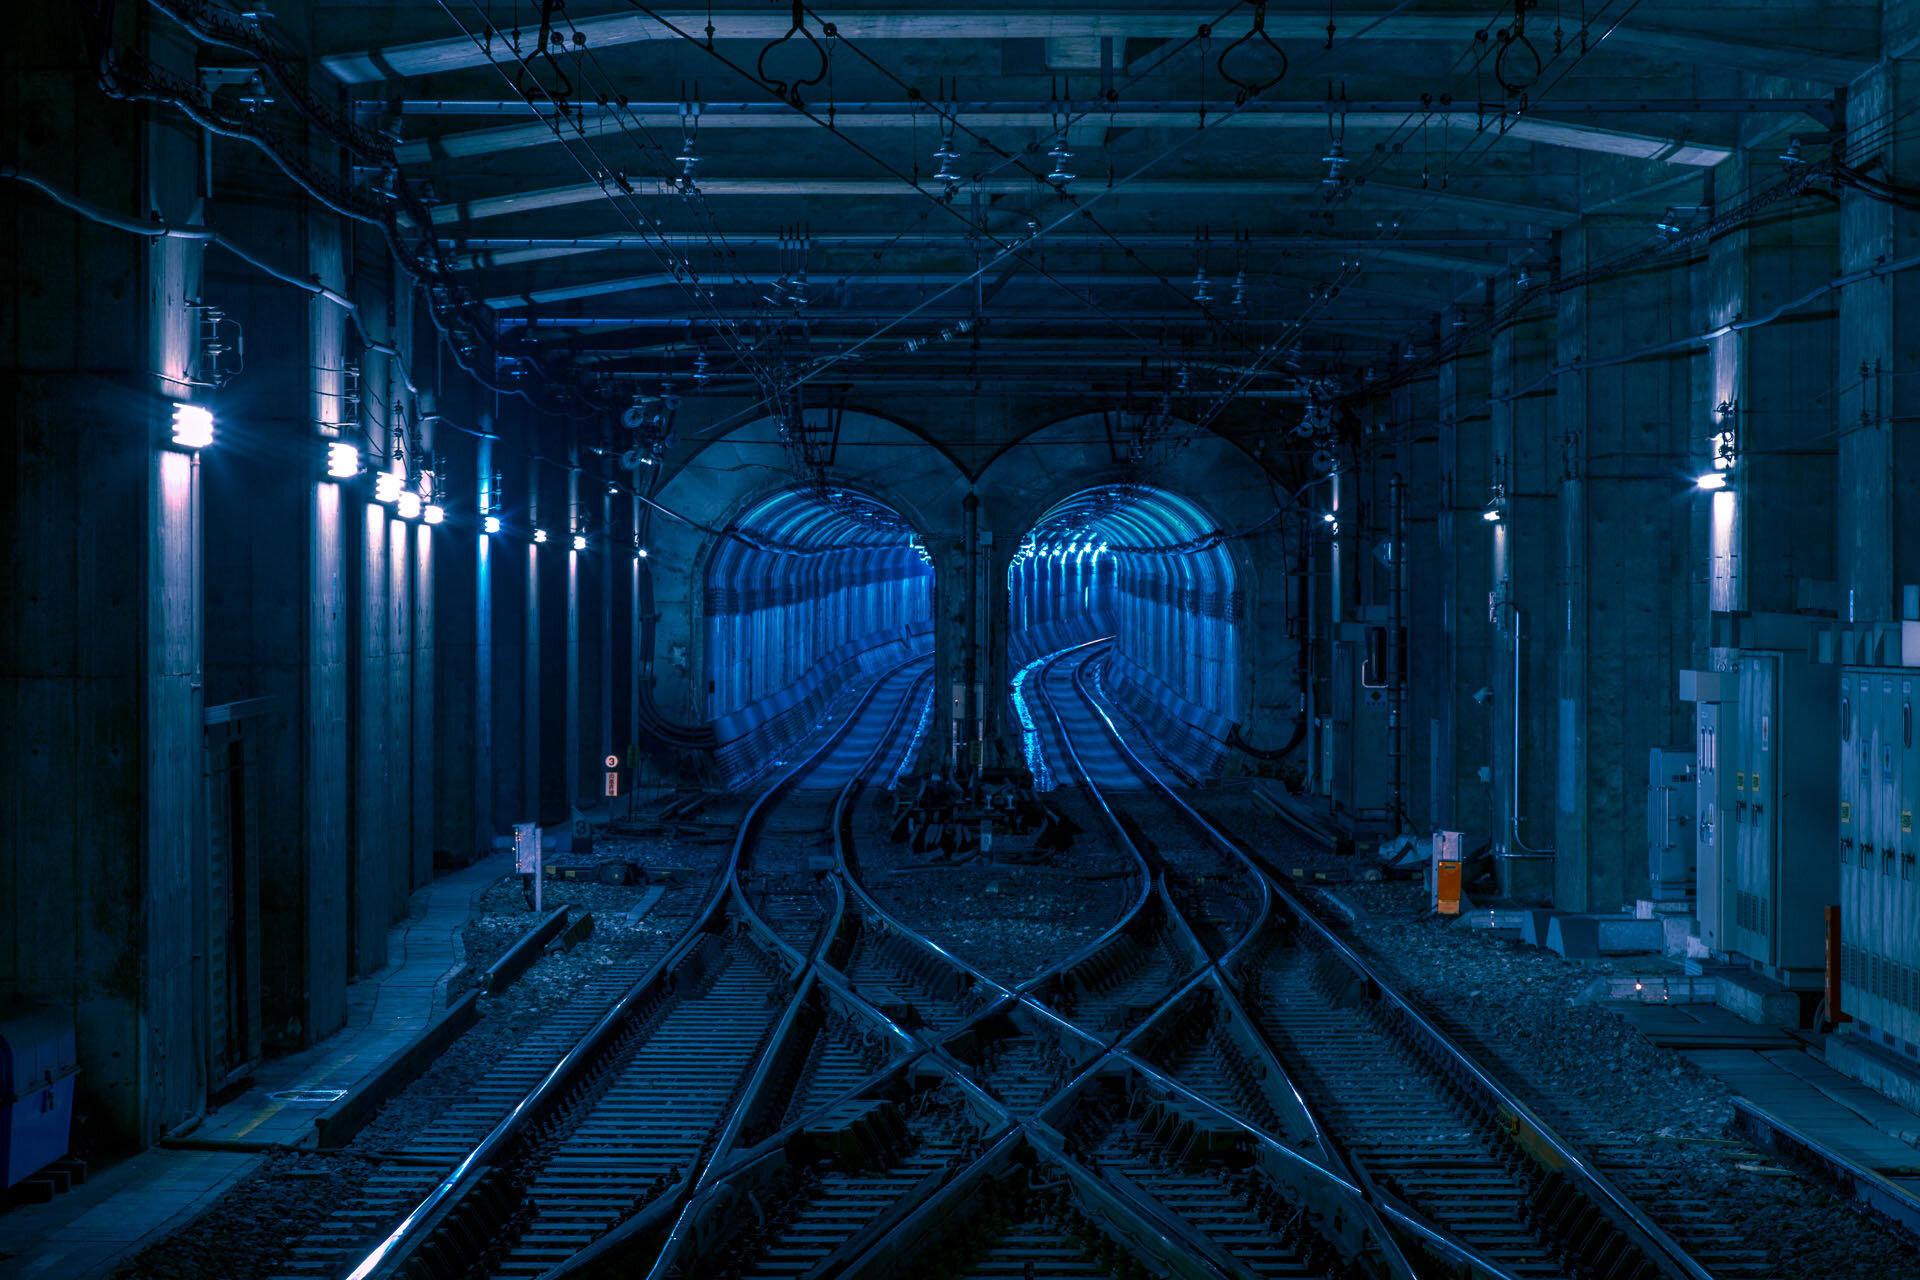 silent-city-4.jpg